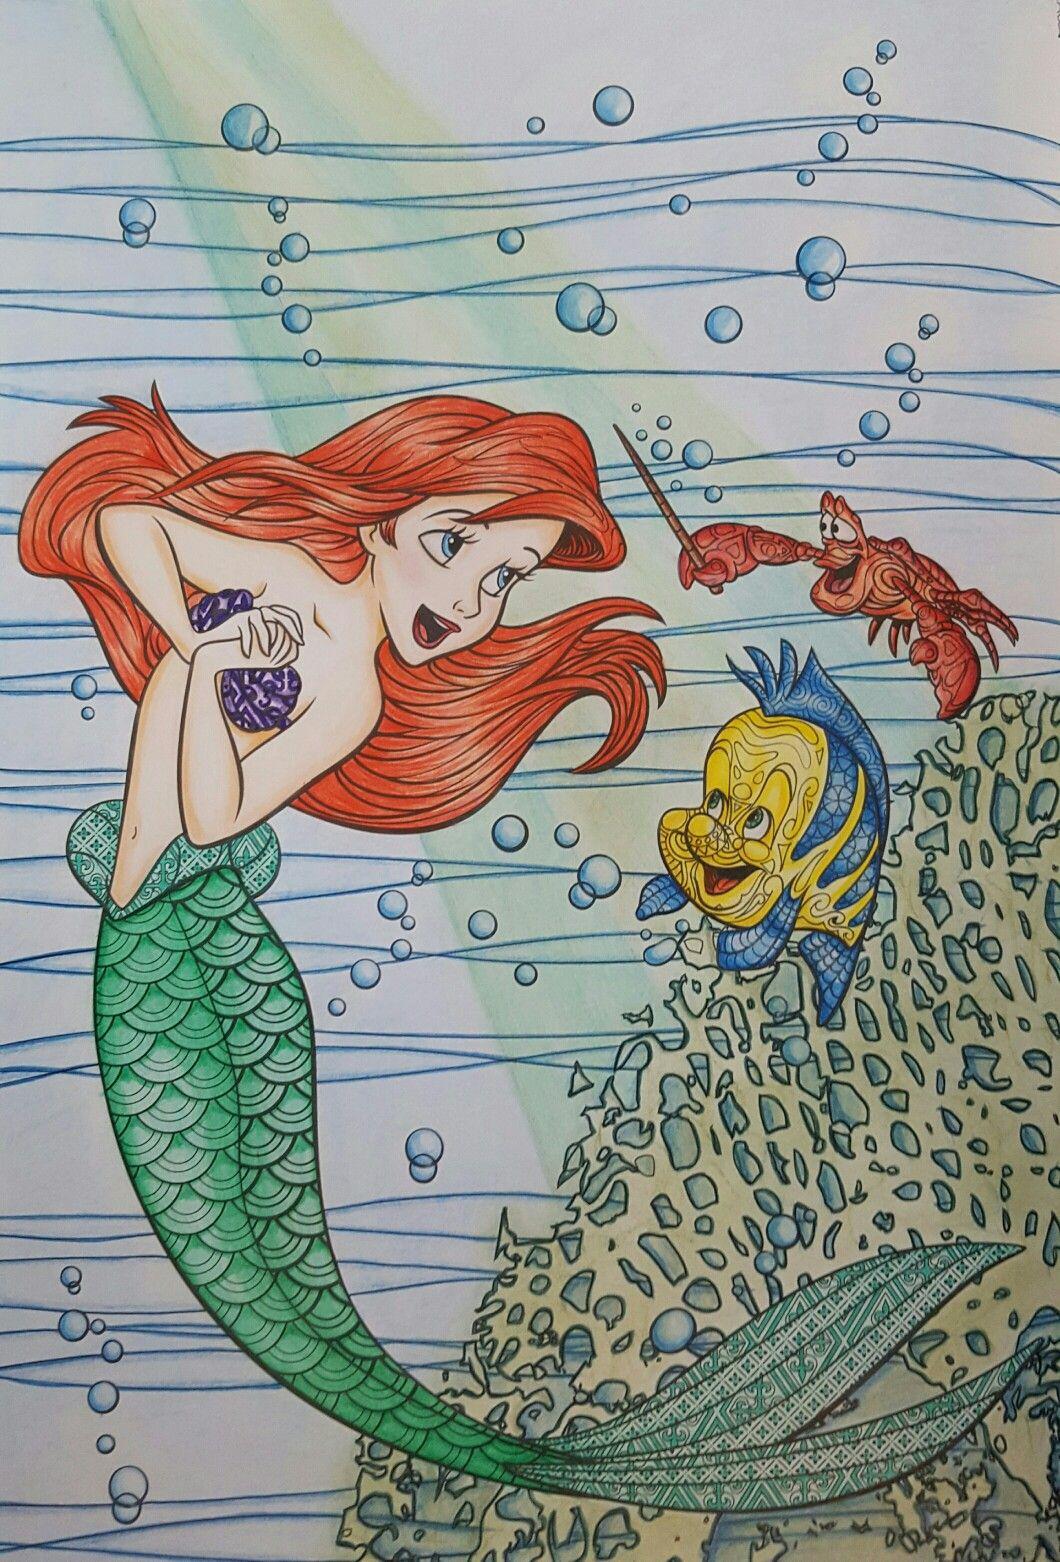 La petite sirène - Le bestiaire extraordinaire - Disney